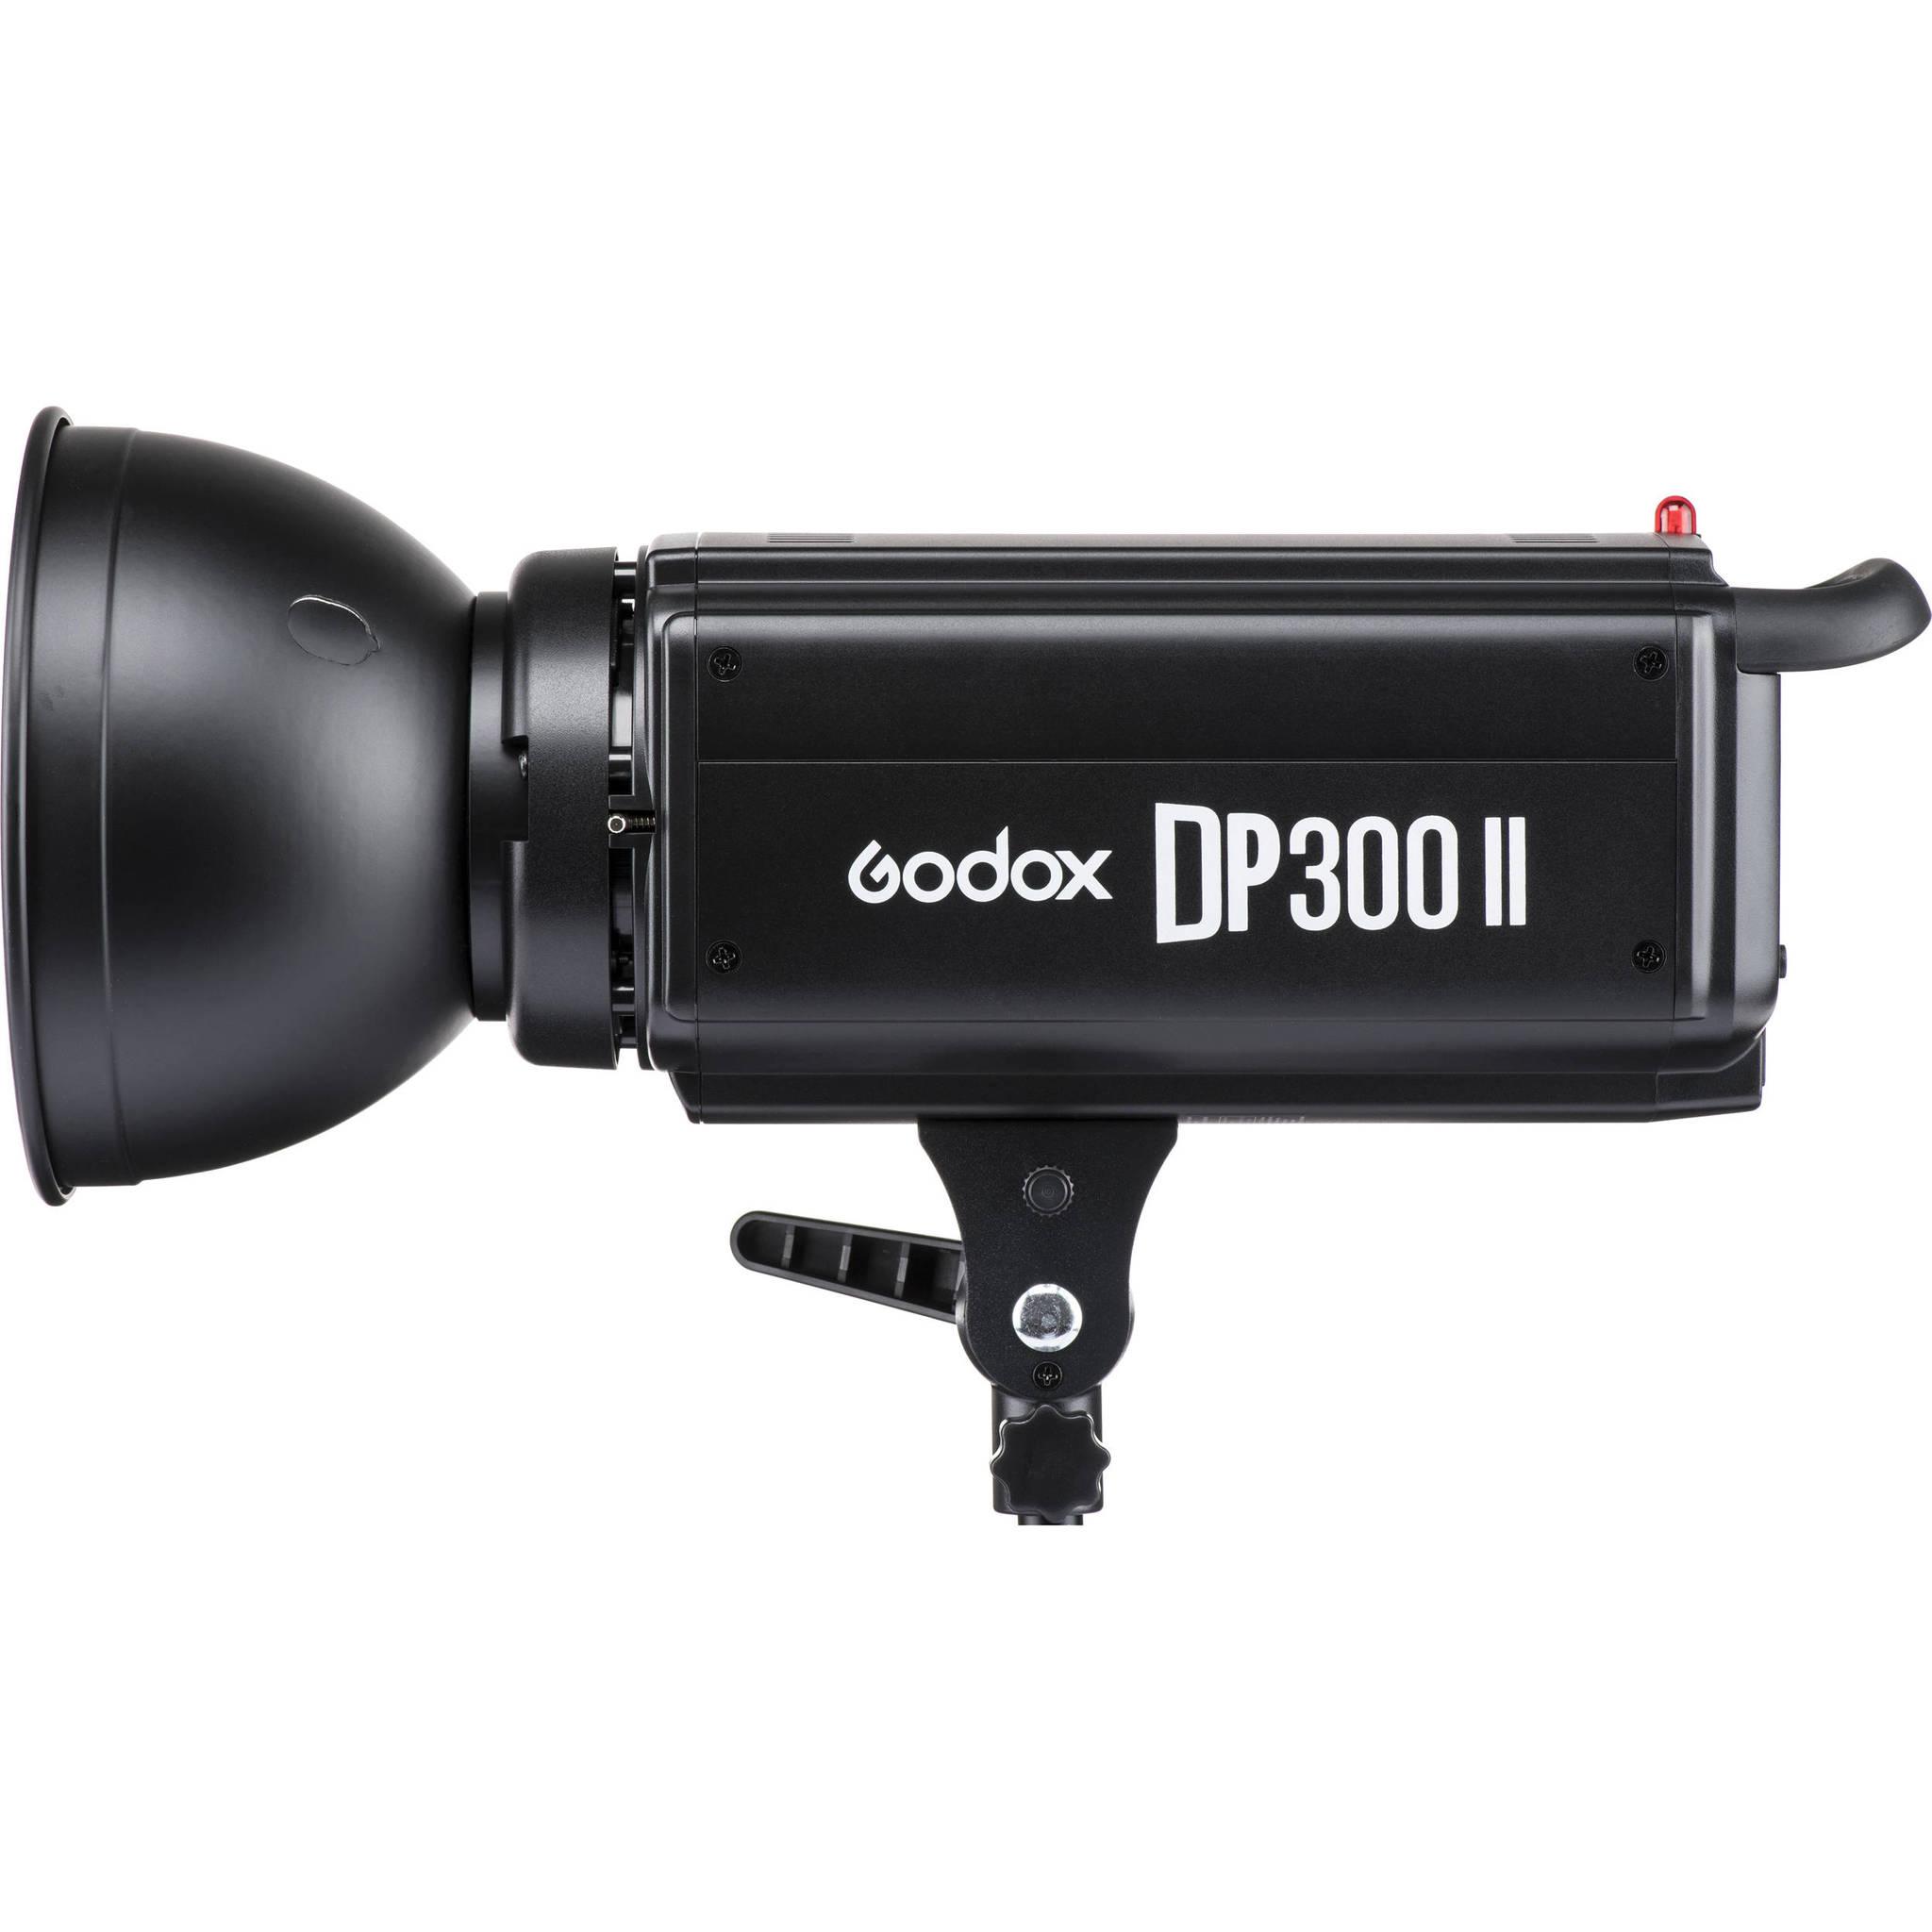 Godox DP300II